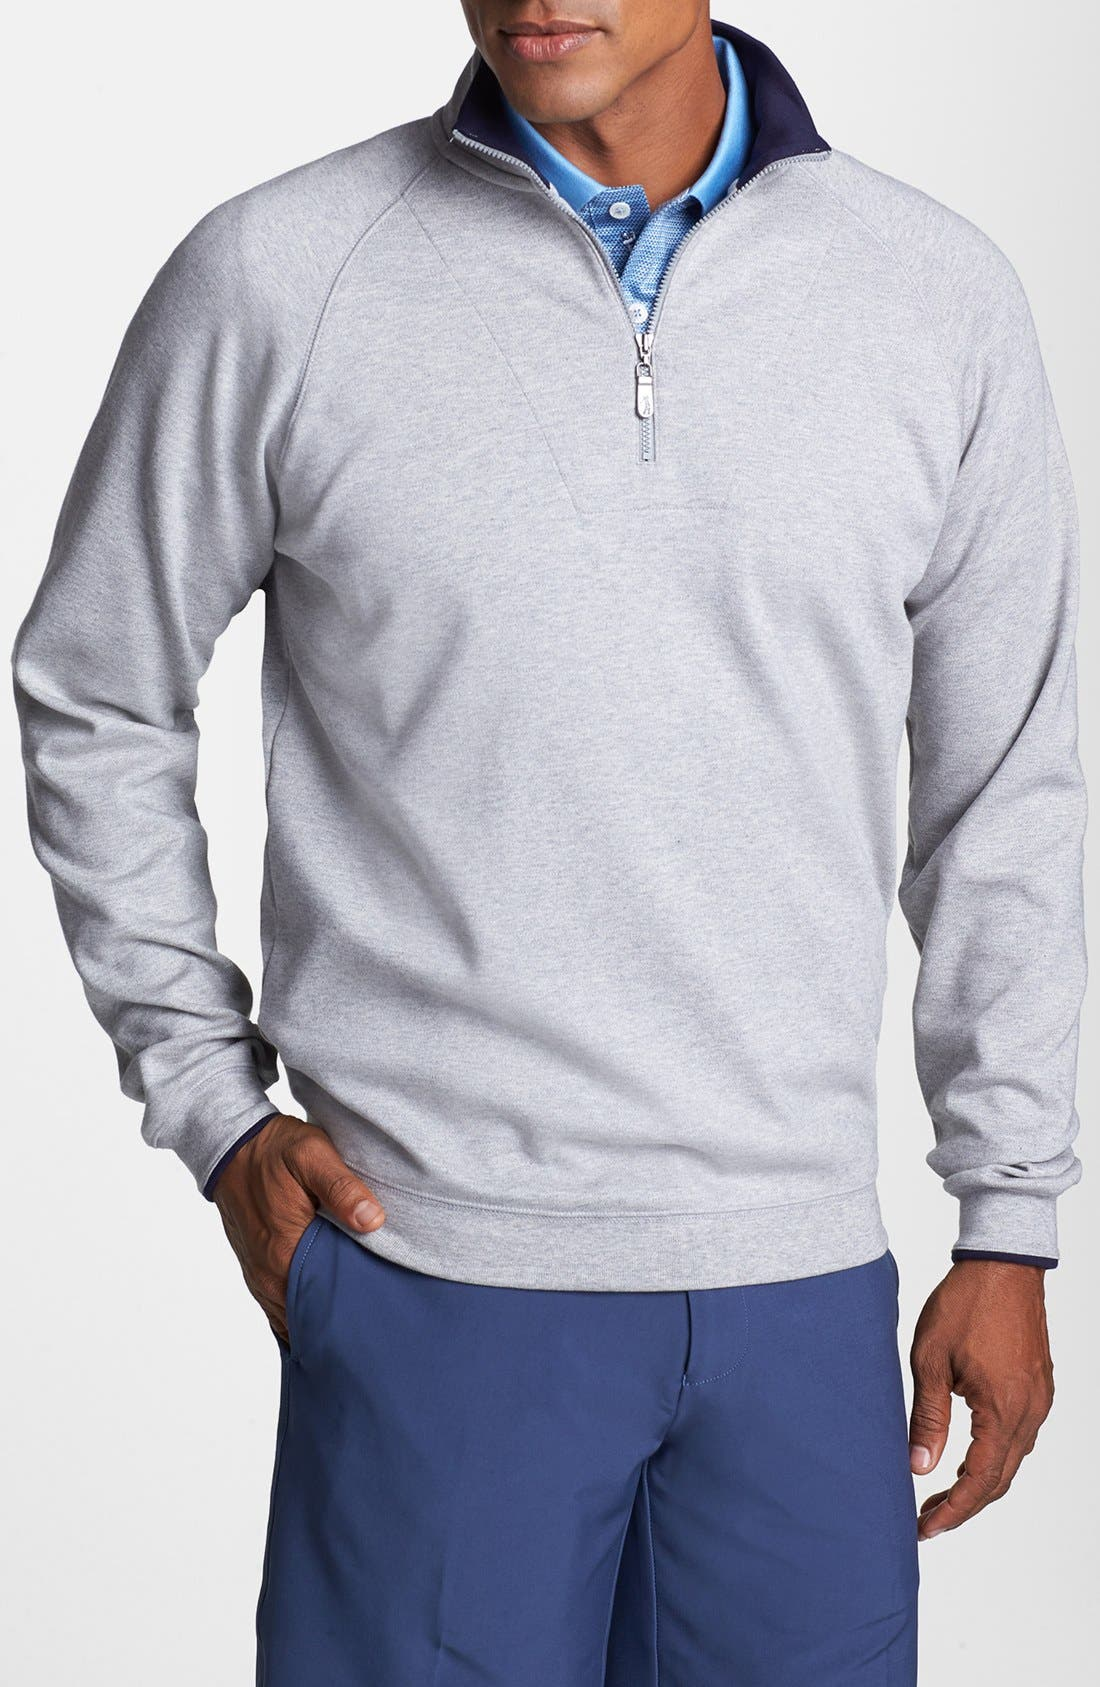 Main Image - Bobby Jones 'Competition' Half Zip Pullover